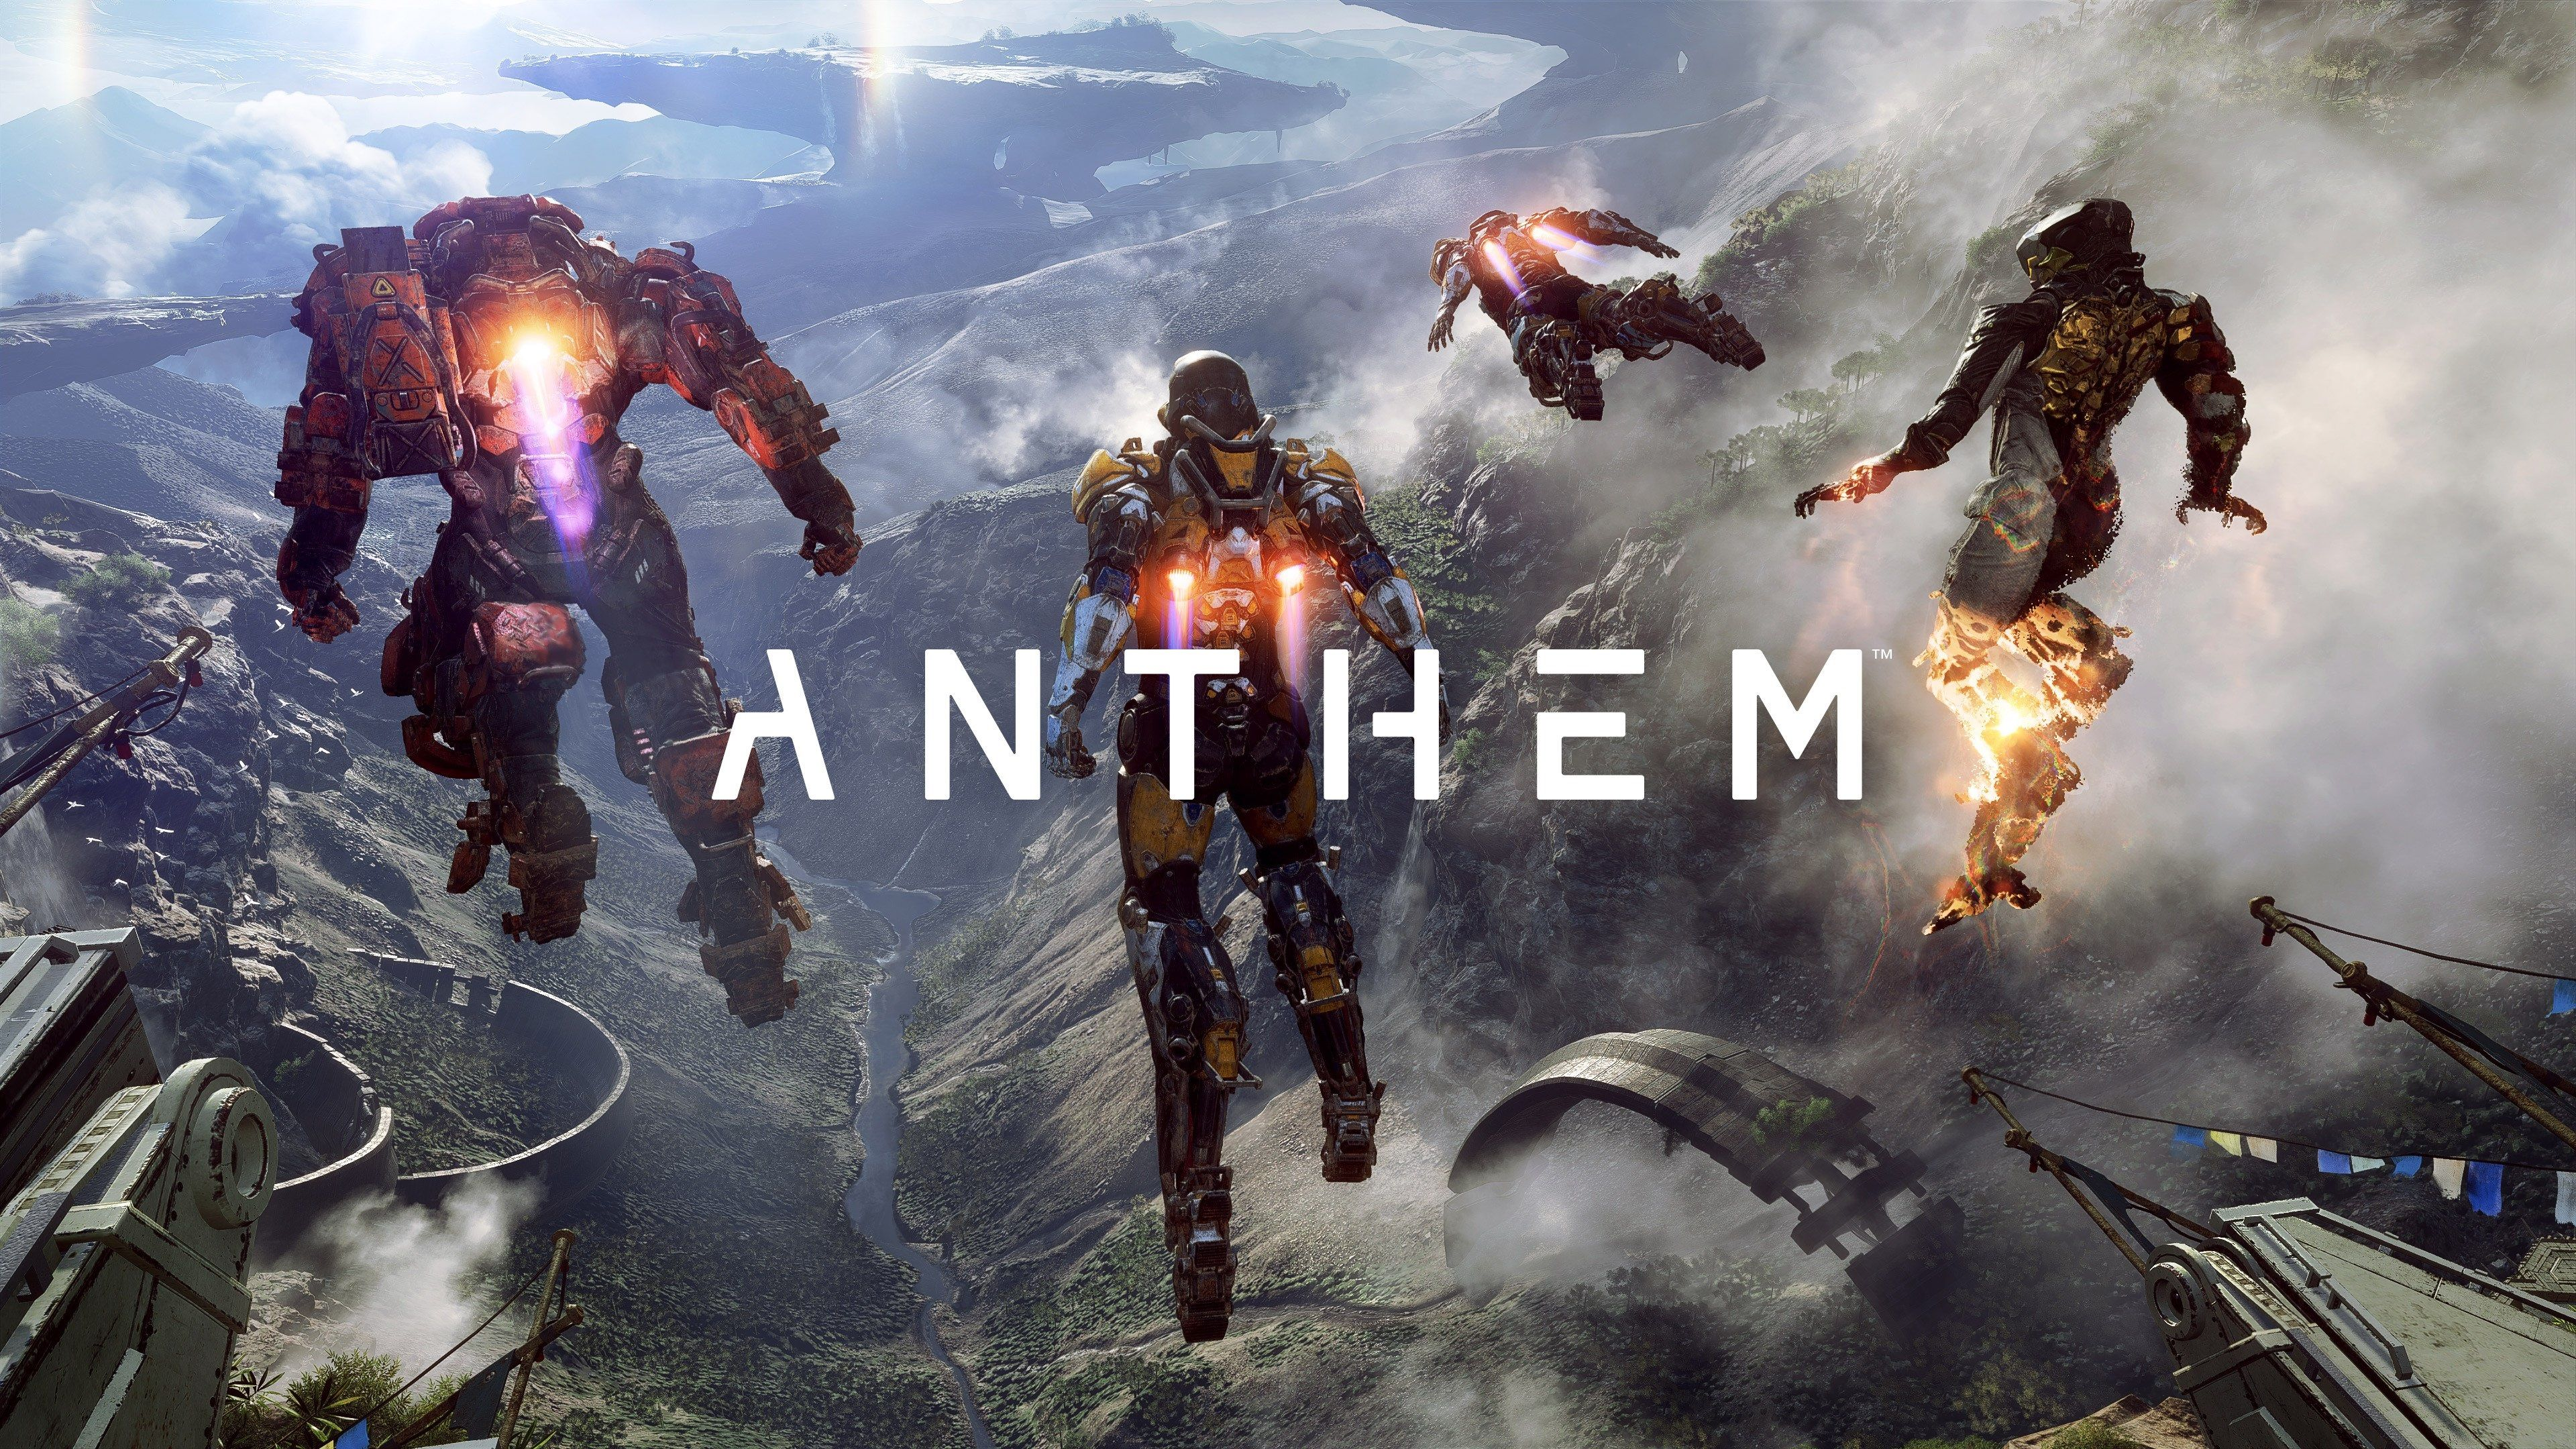 3840x2160 Anthem 4k Hd Wallpaper Download For Pc Anthem In